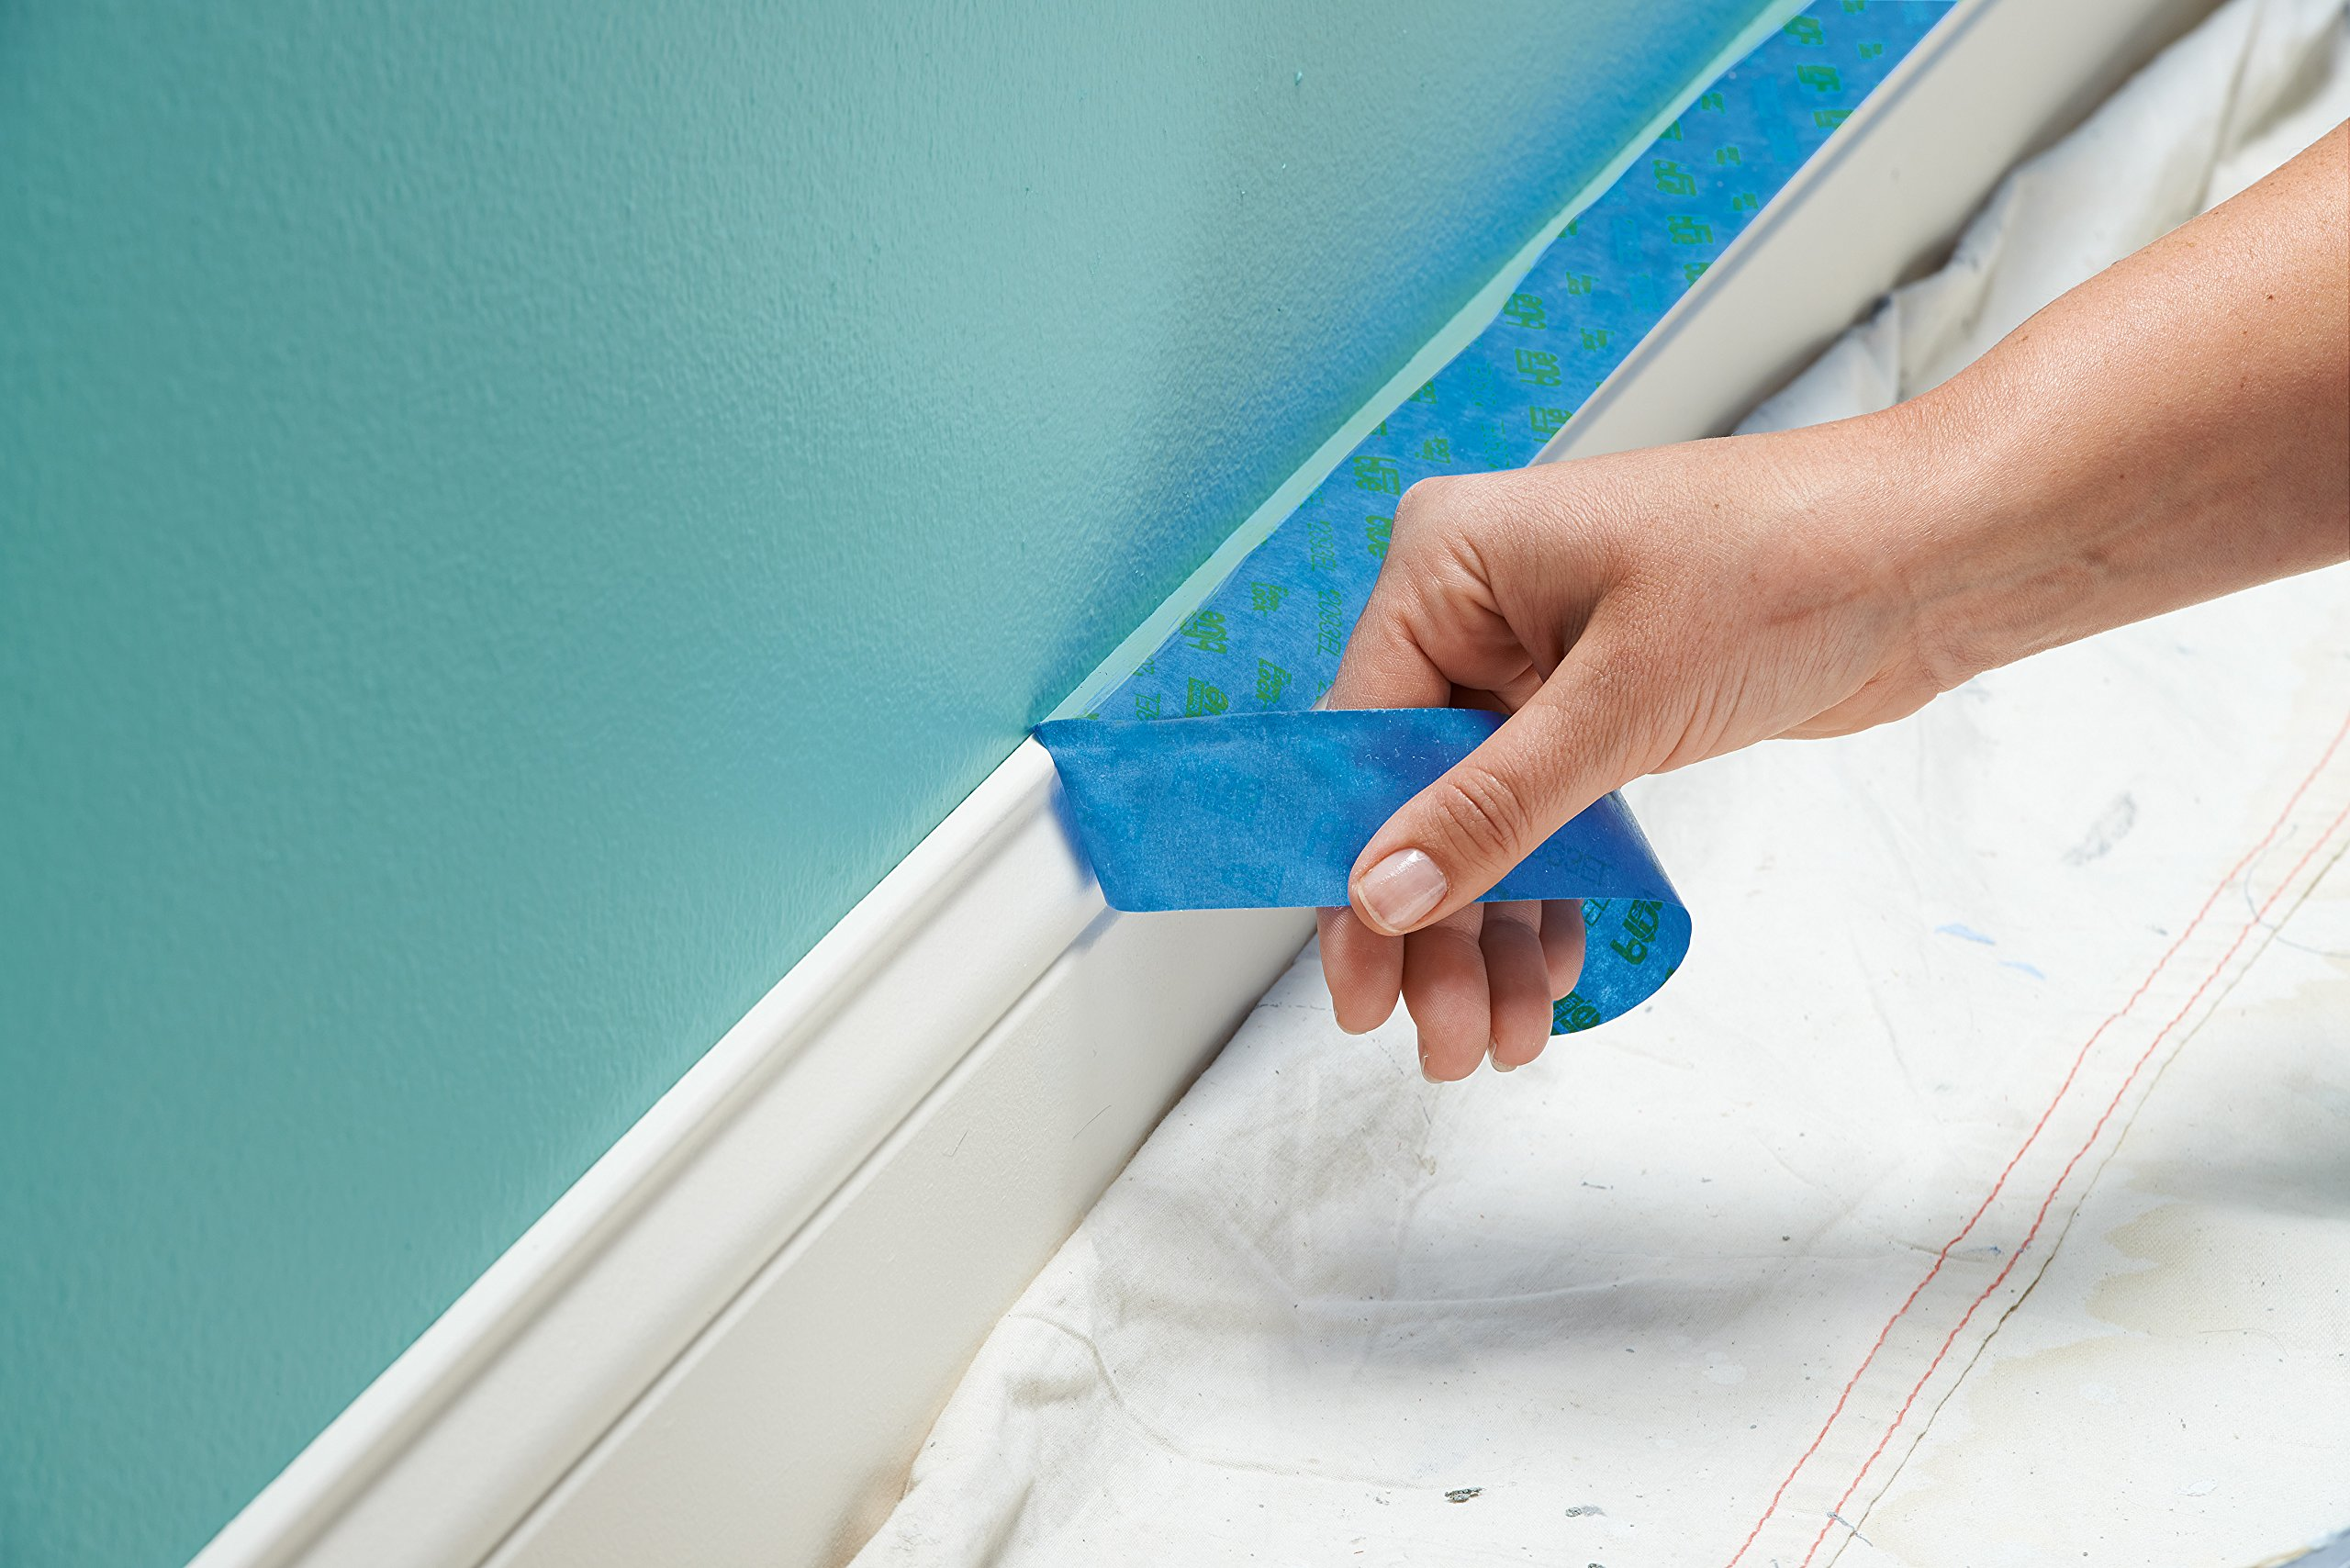 ScotchBlue 2093EL-24CVP Trim + BASEBOARDS Painters Tape.94 in x 60 yd, 3 Rolls, Blue by ScotchBlue (Image #4)